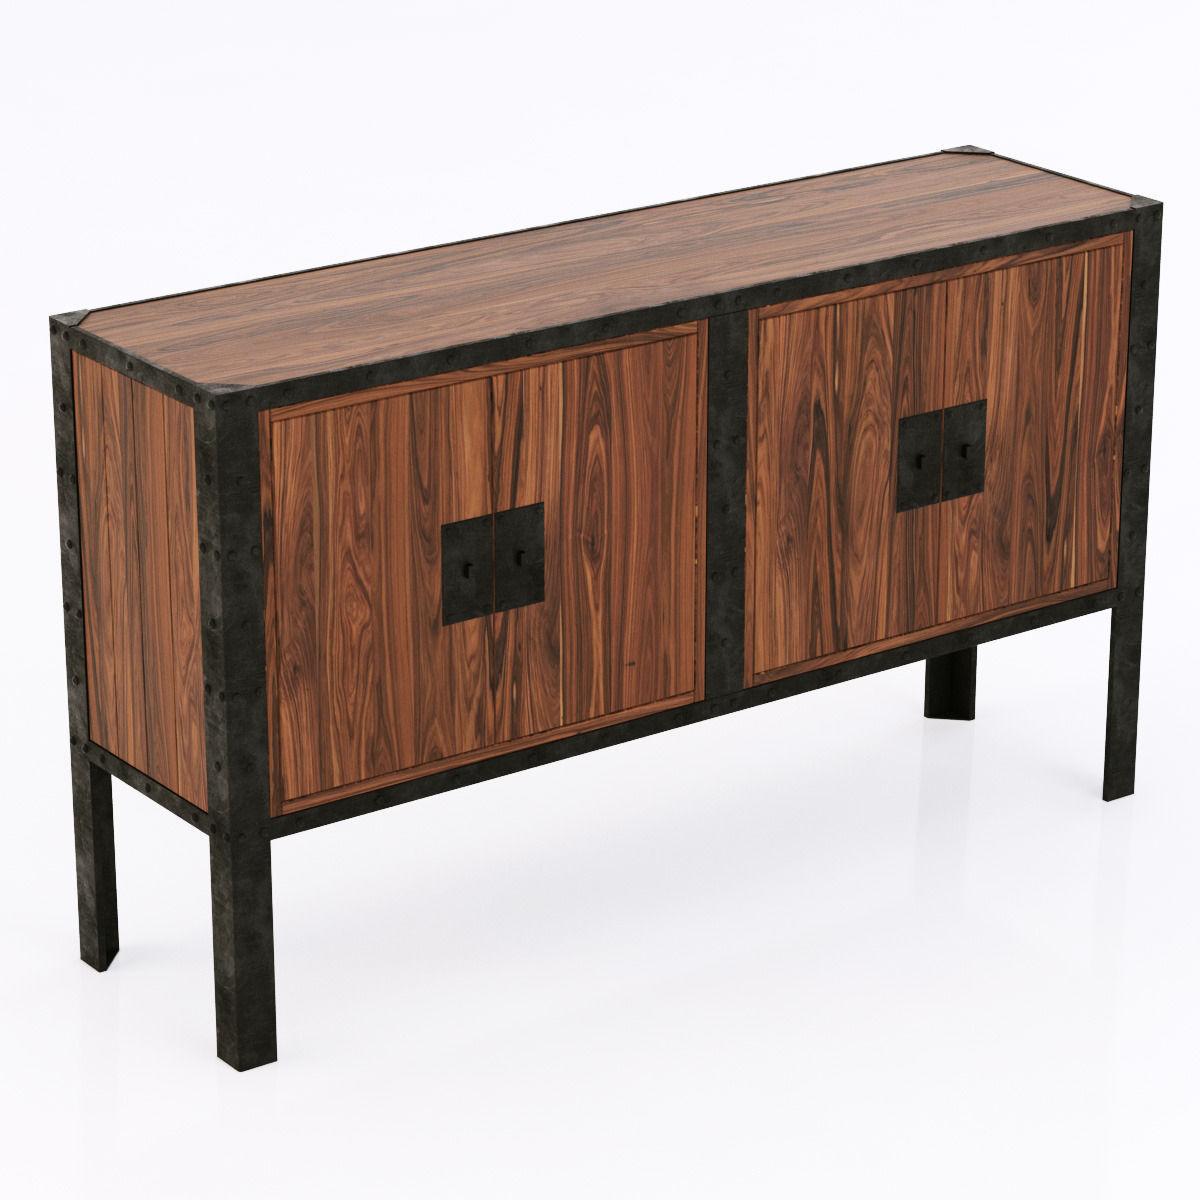 Dovetail furniture 3d model max obj mtl 3ds fbx 1